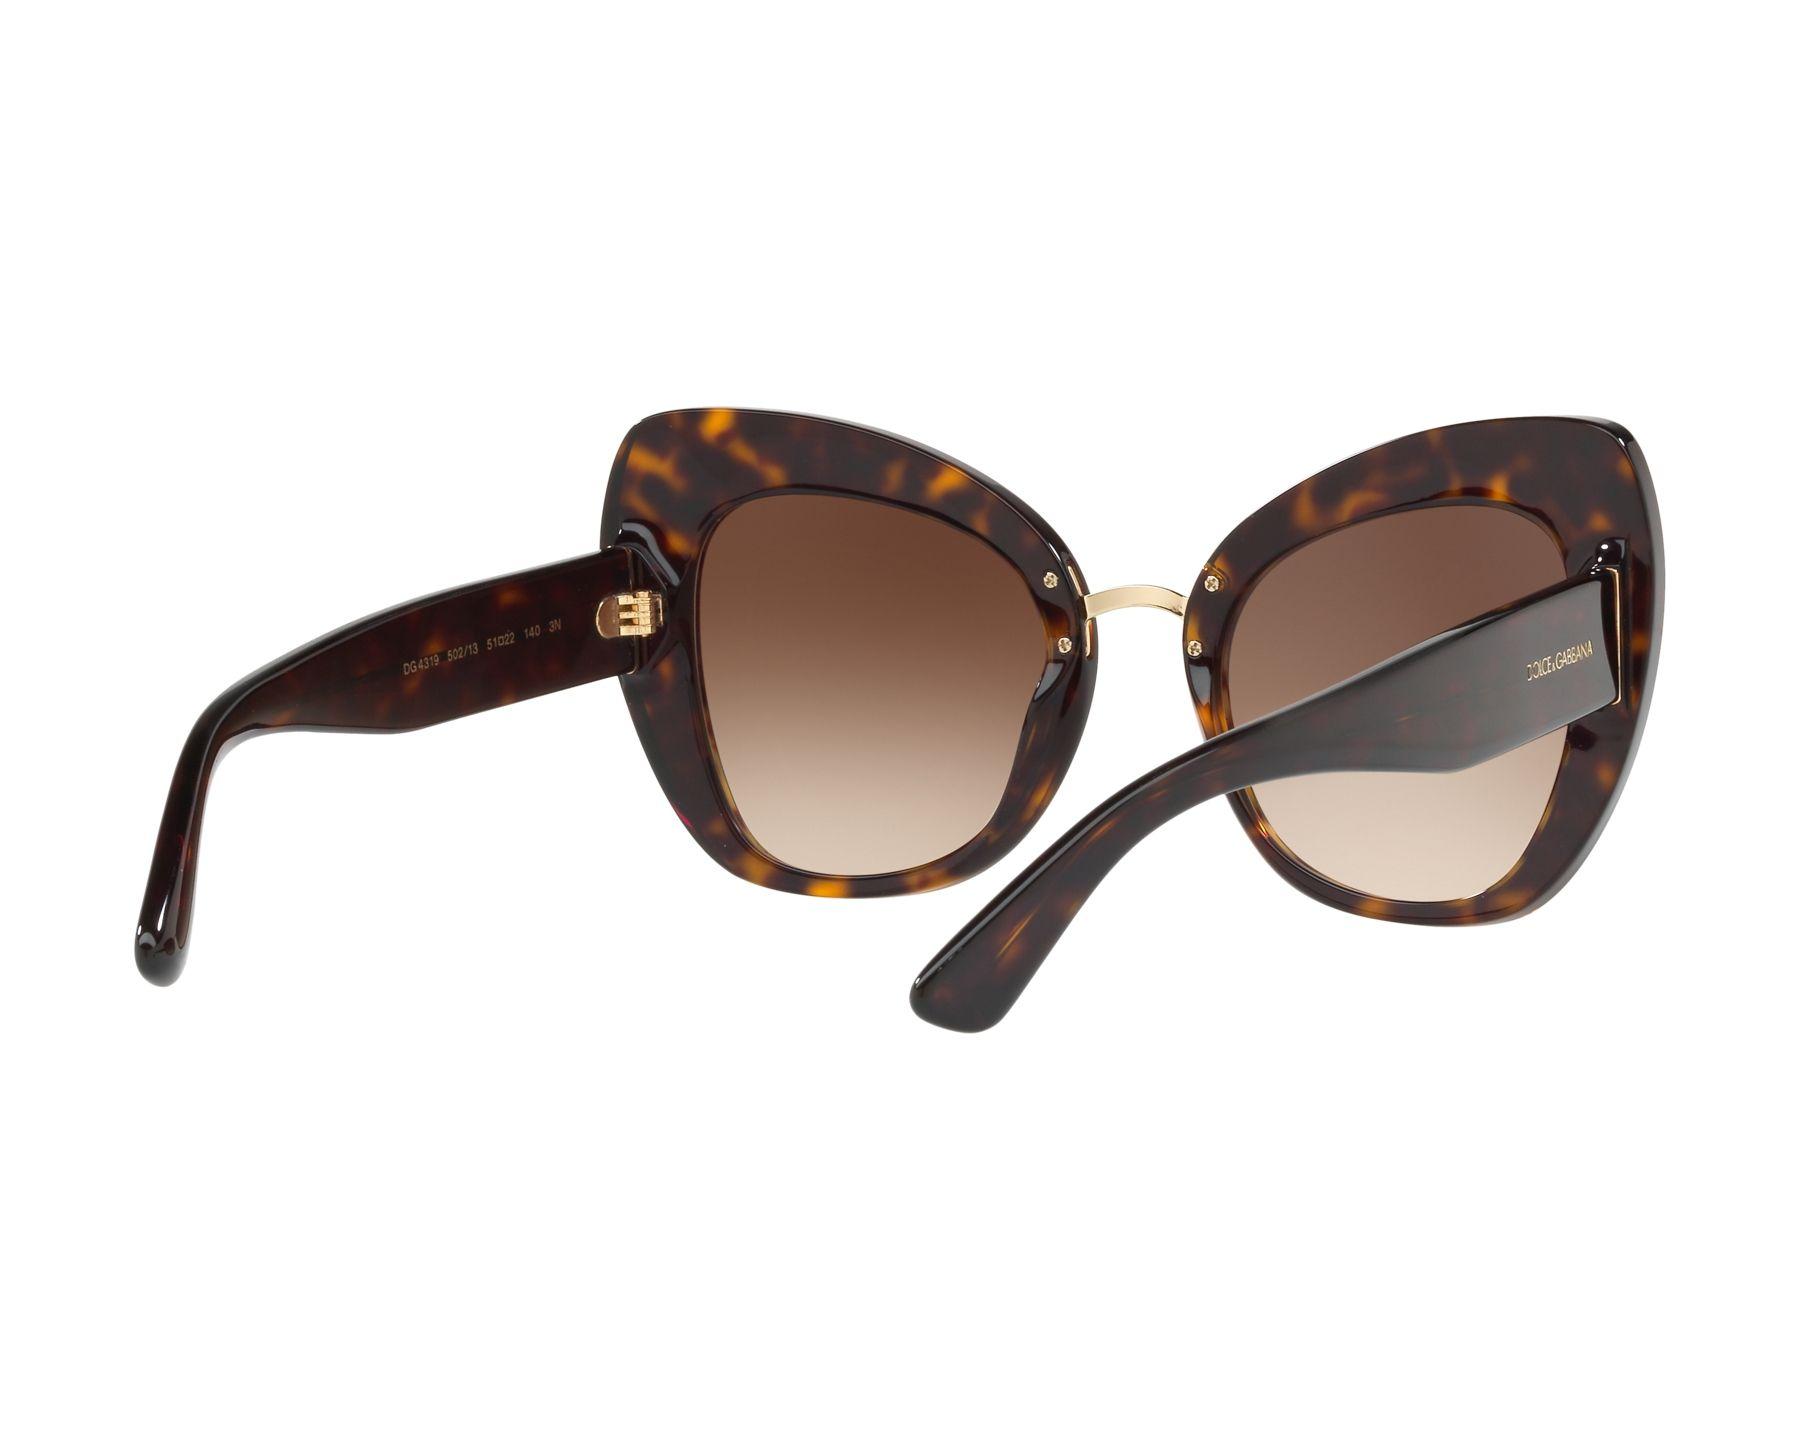 d6842b9214f4 Sunglasses Dolce   Gabbana DG-4319 502 13 51-22 Havana Gold 360